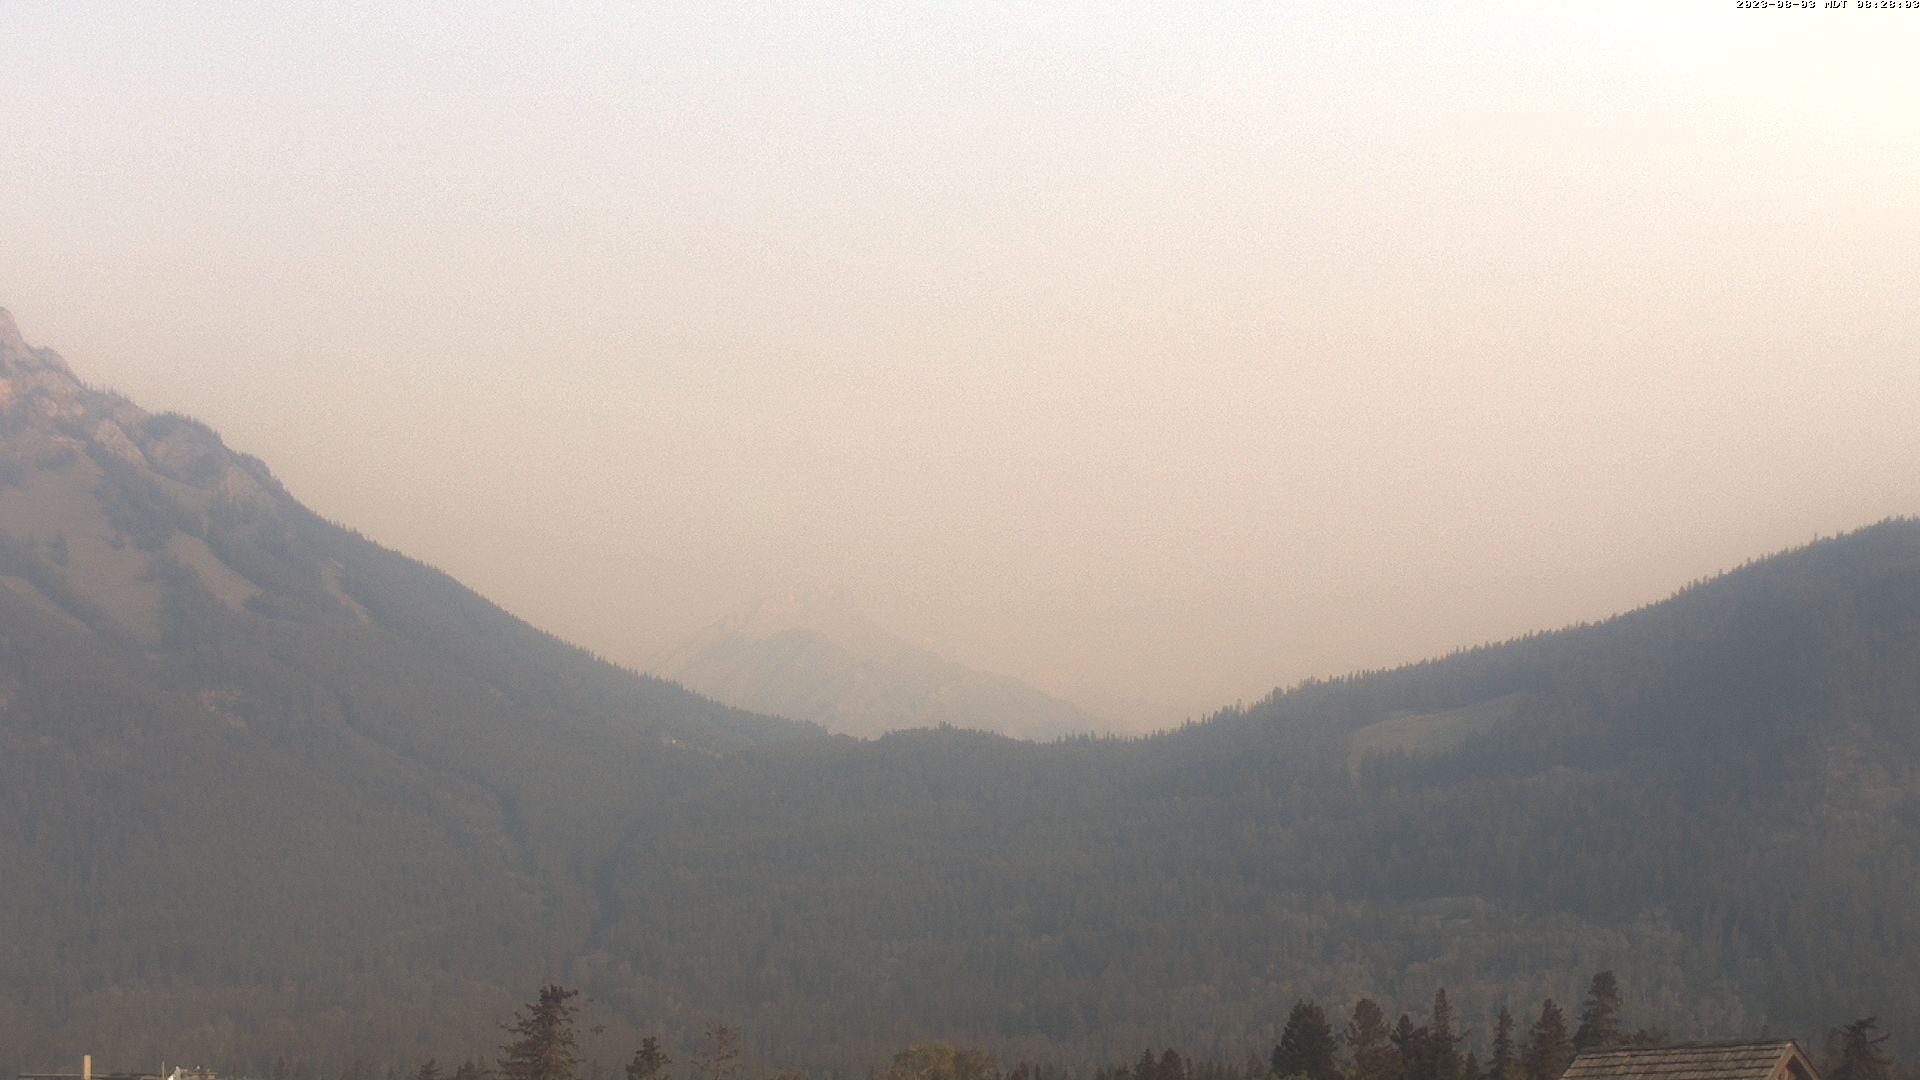 Mt. Norquay Webcam